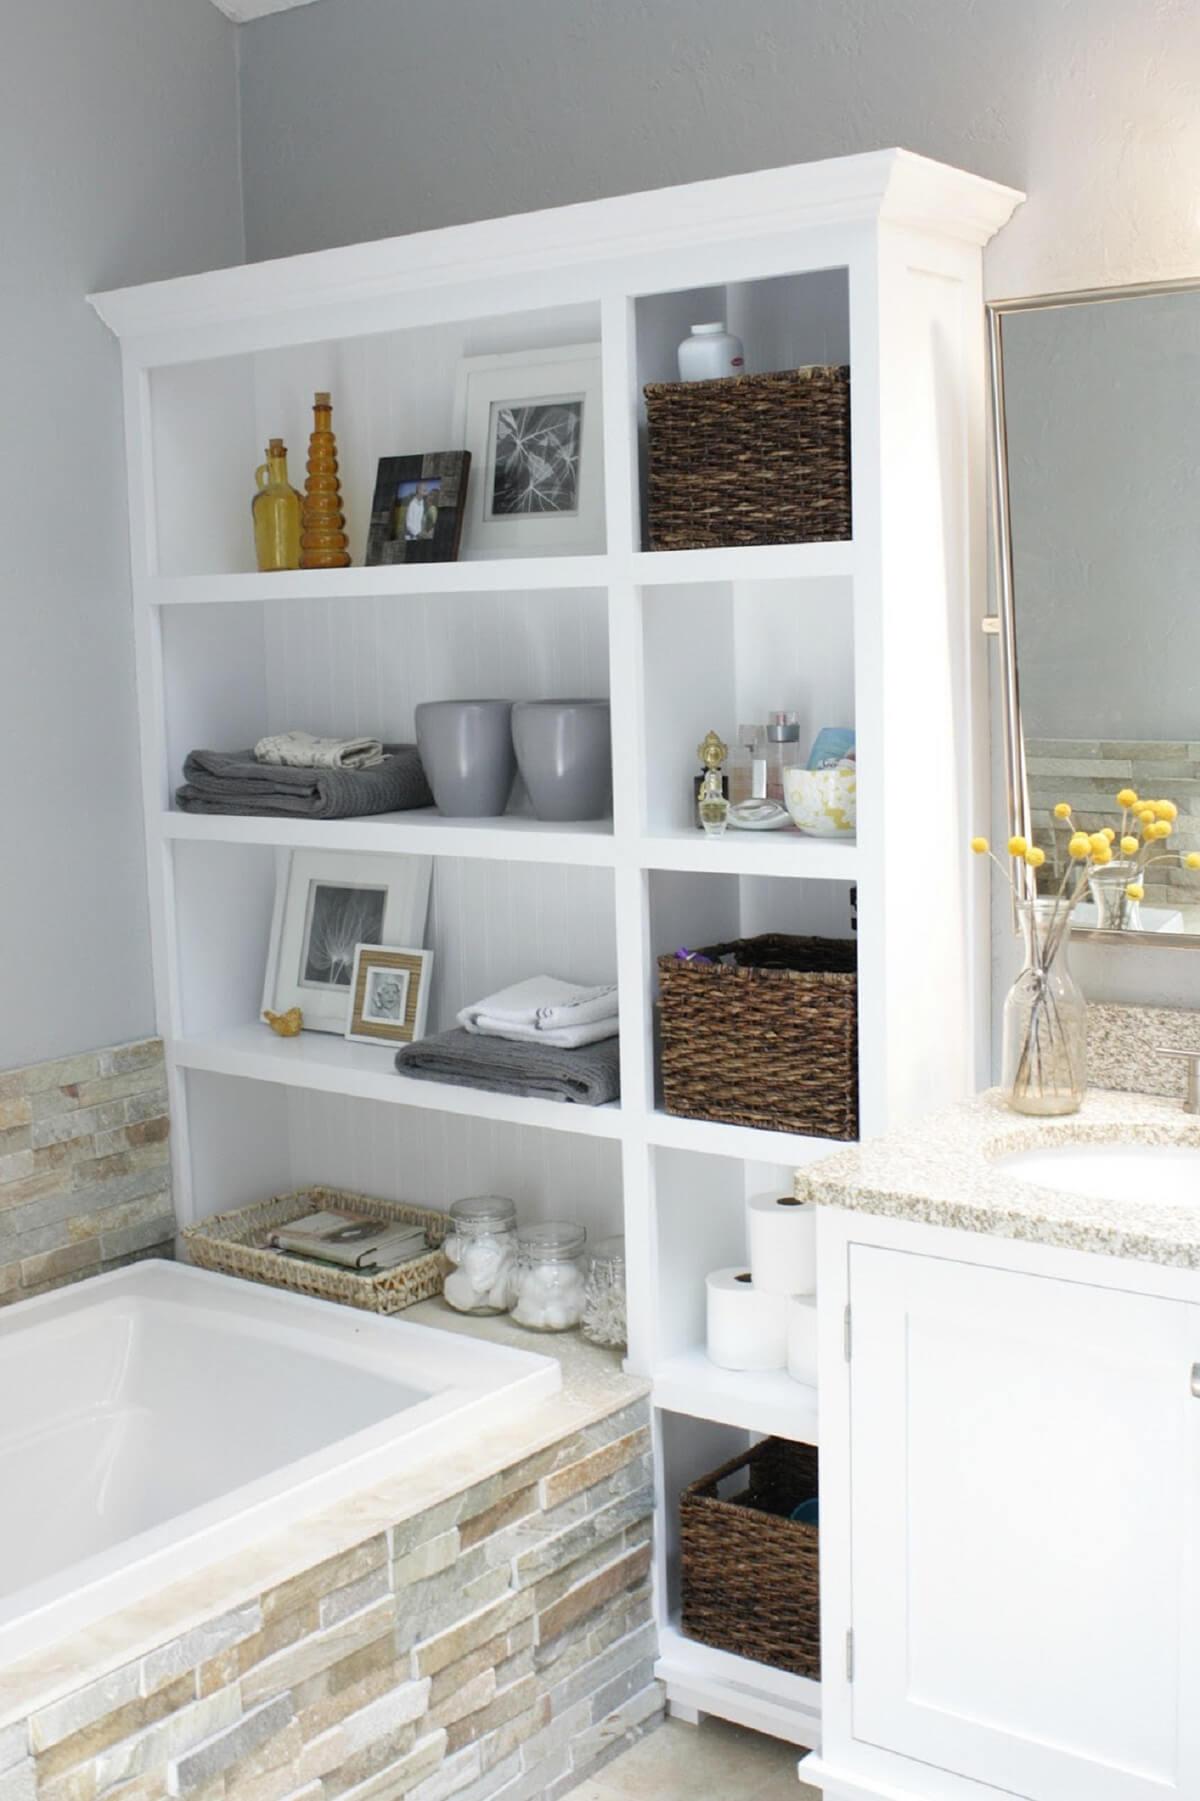 Bathroom Cabinet Ideas Johnbonham Memorialfund Small with regard to size 1200 X 1801